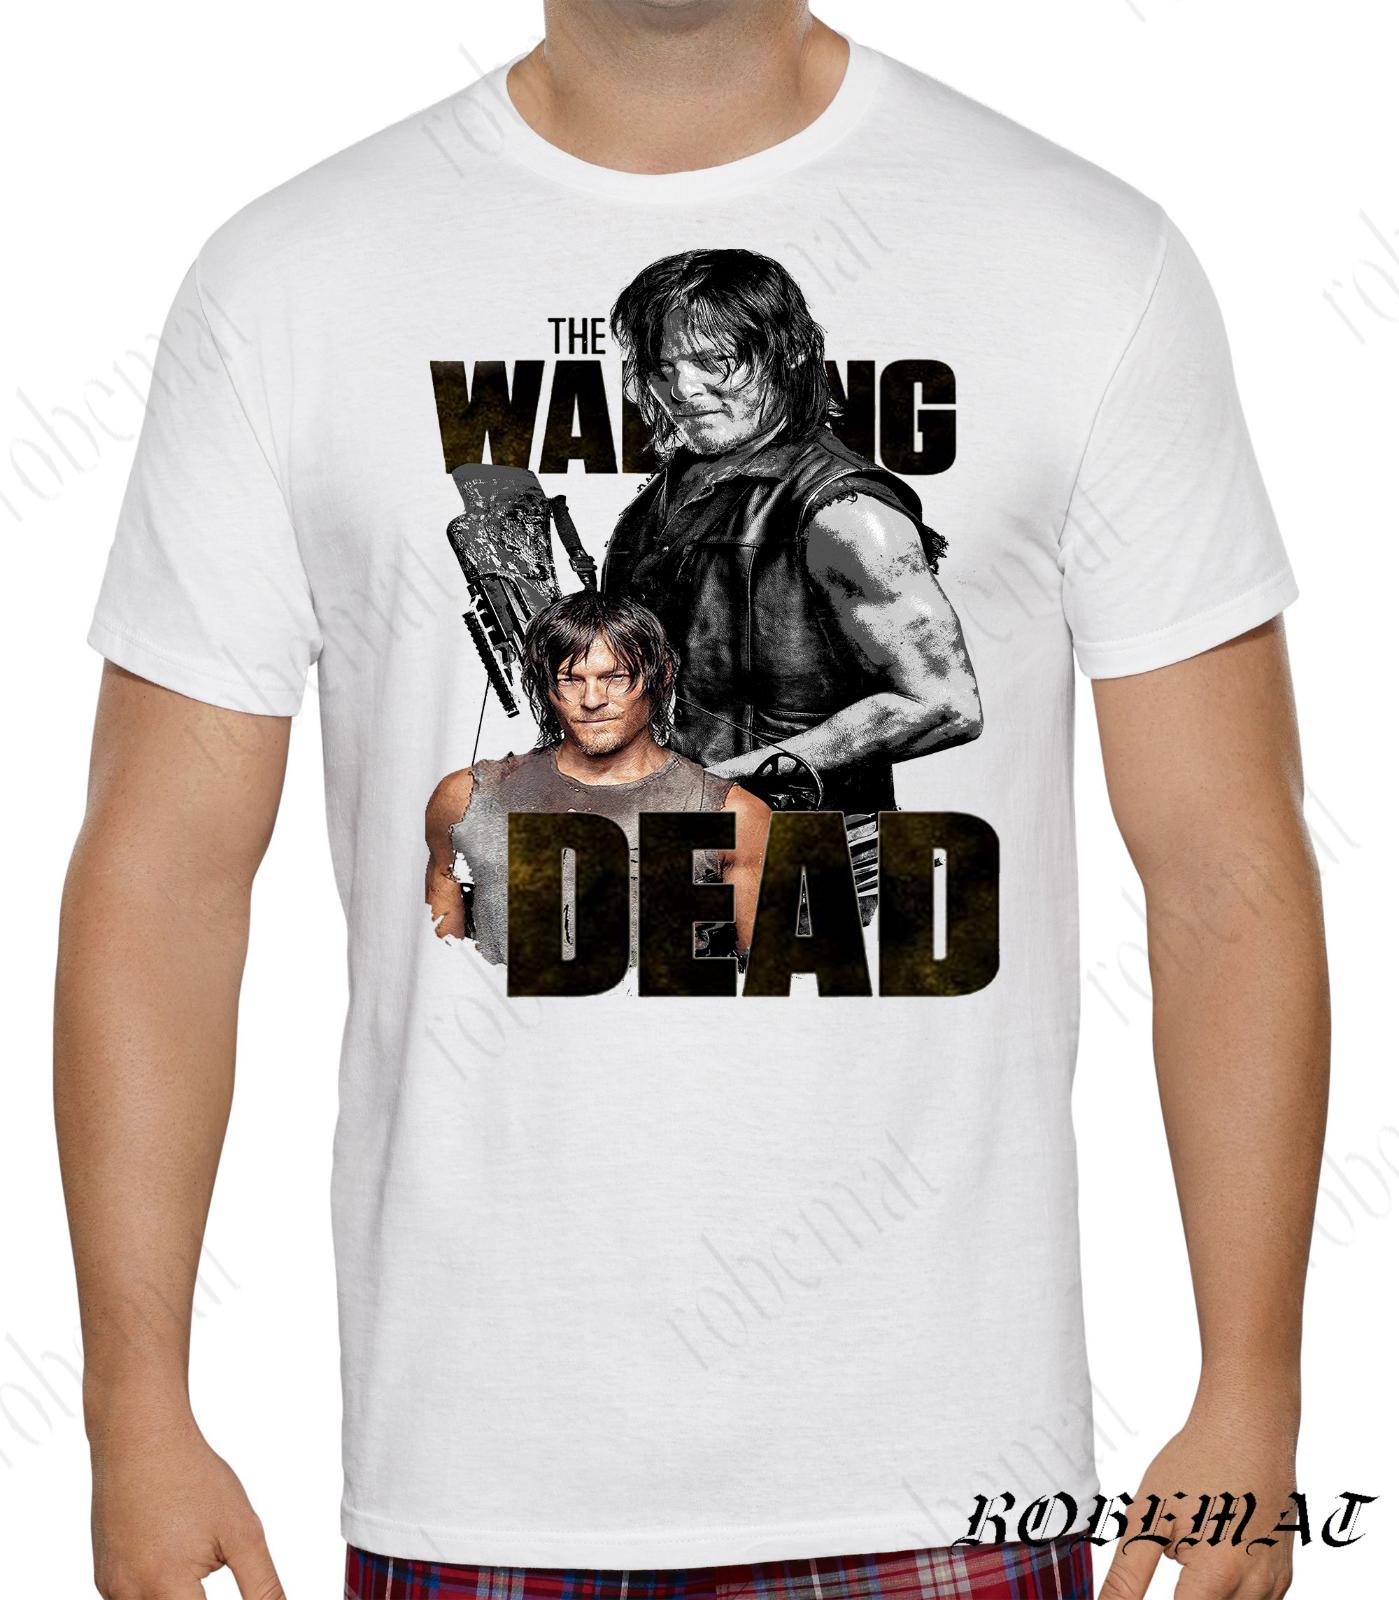 t-shirt-mens-womens-t-shirt-font-b-the-b-font-font-b-walking-b-font-font-b-dead-b-font-daryl-dixon-birtbday-gift-funny-cool-casual-pride-t-shirt-men-unisex-new-fashion